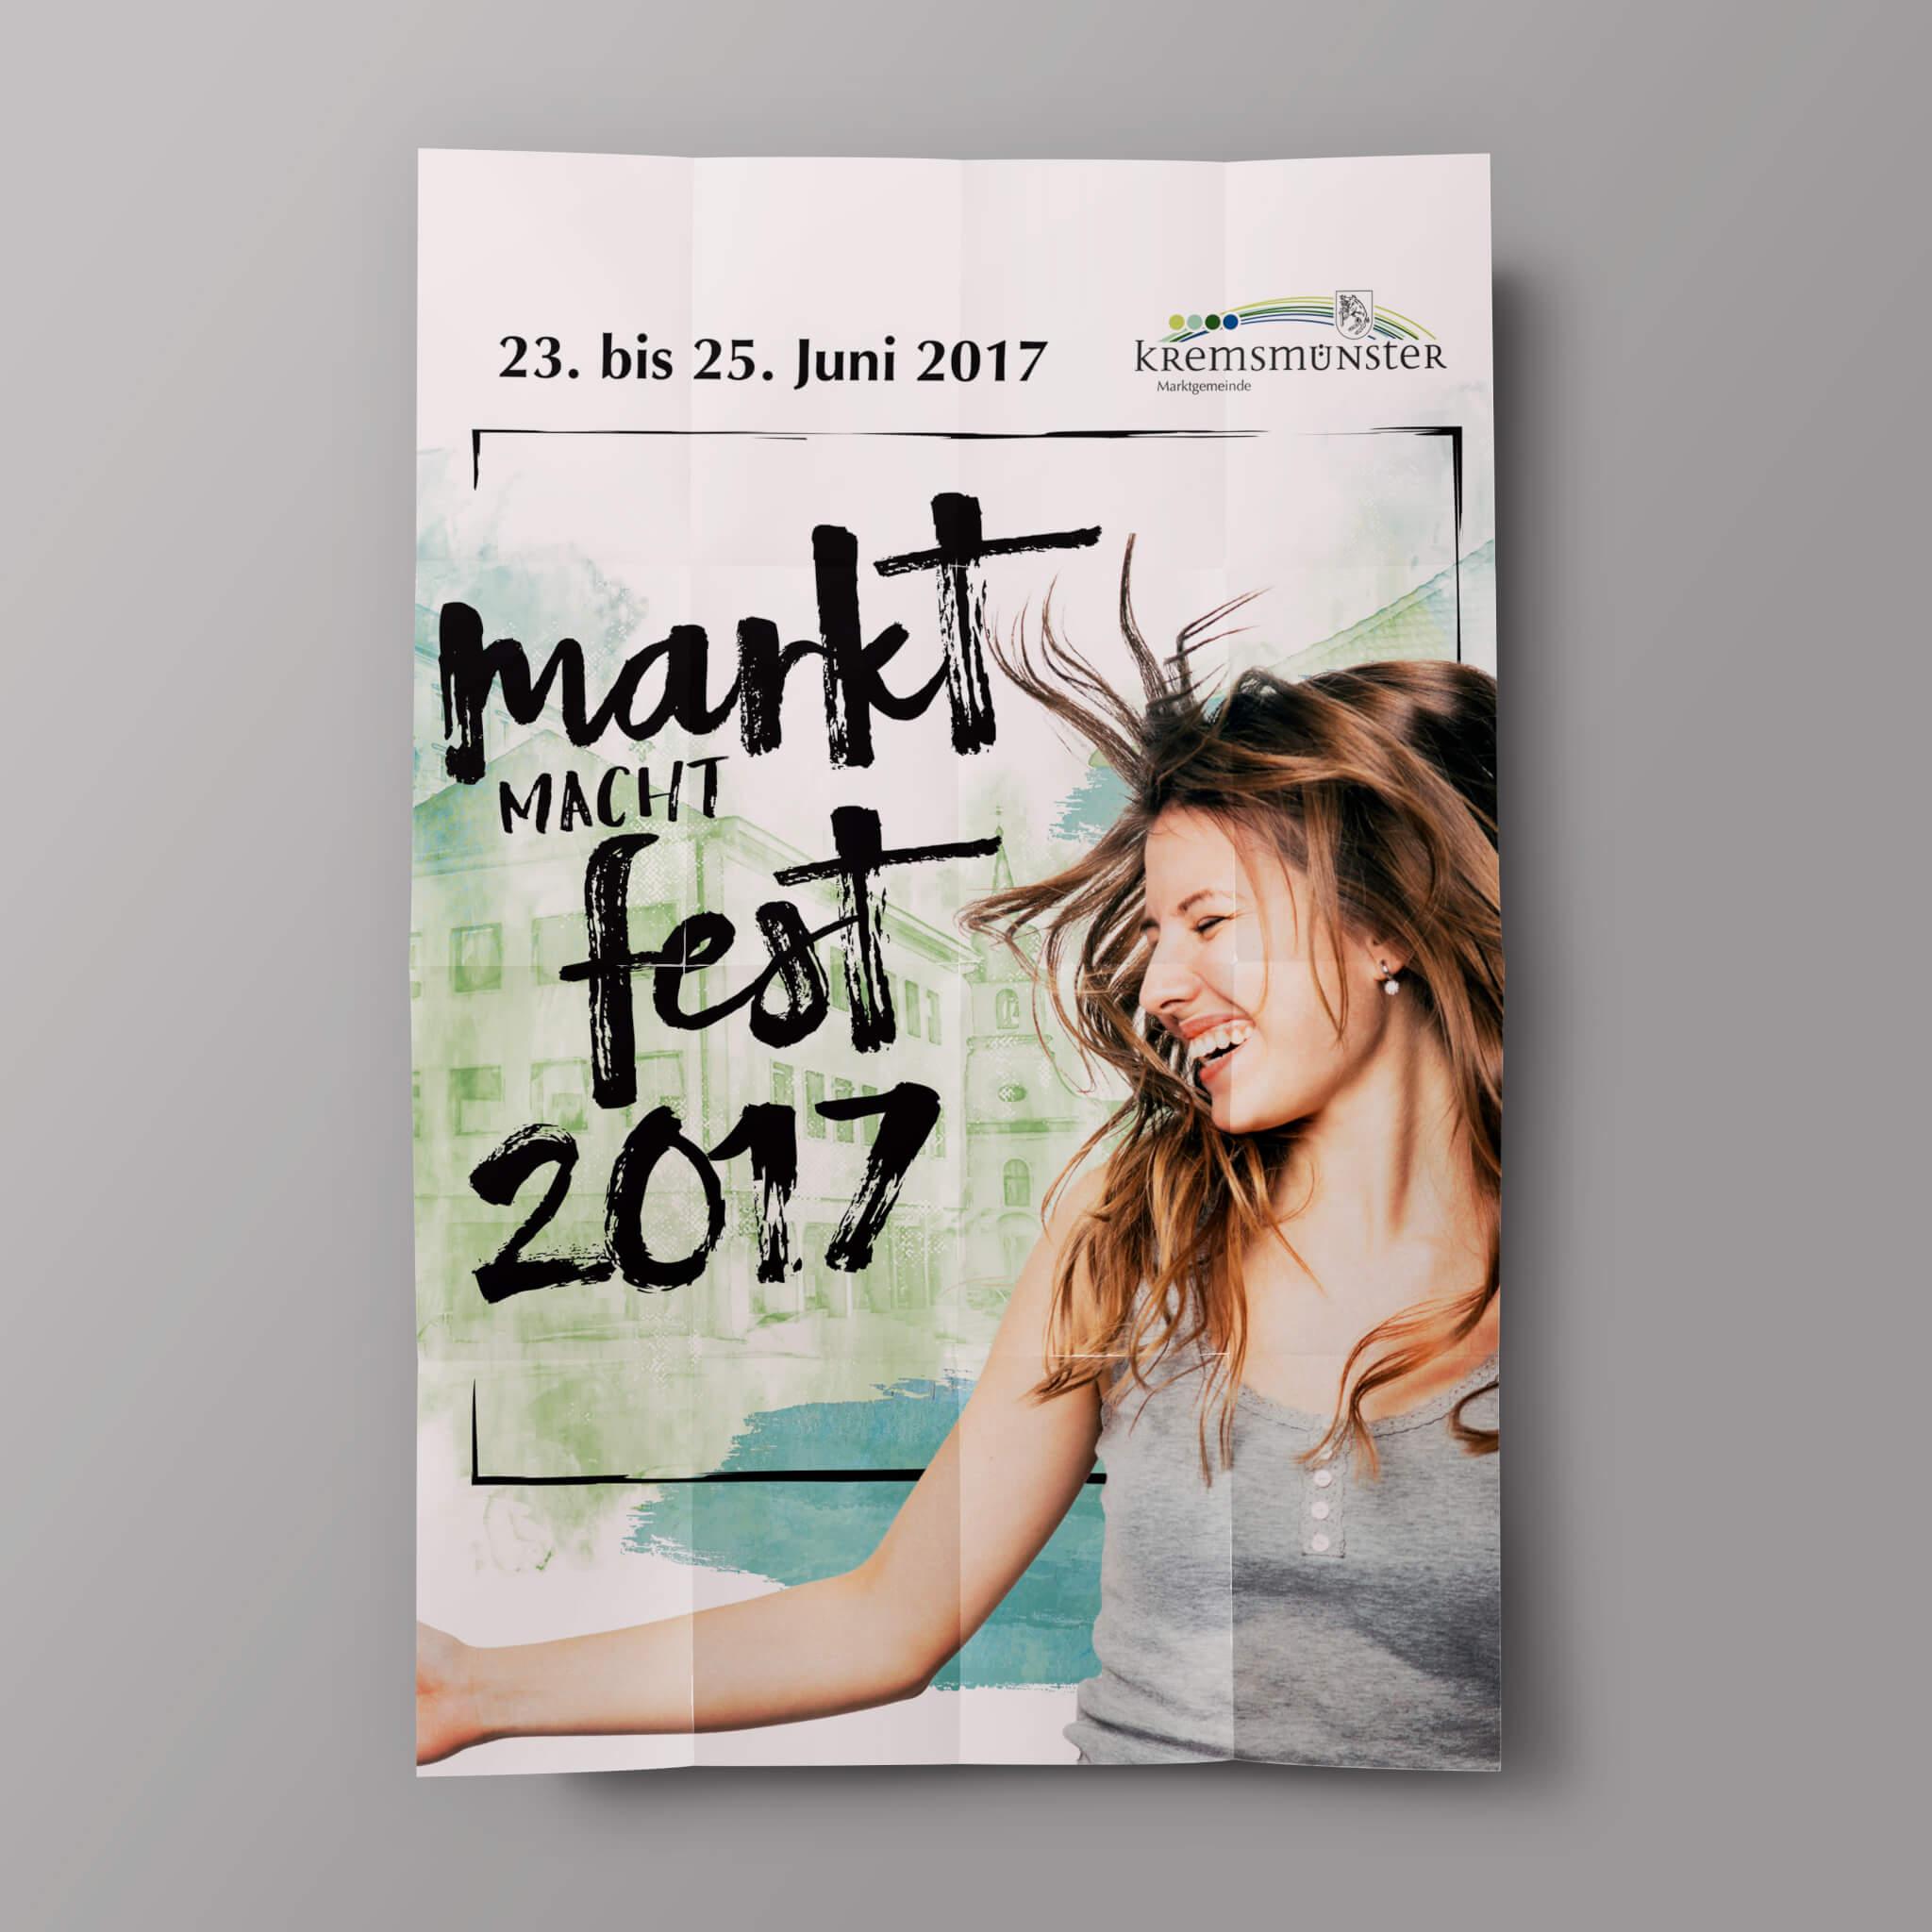 Marktfest2